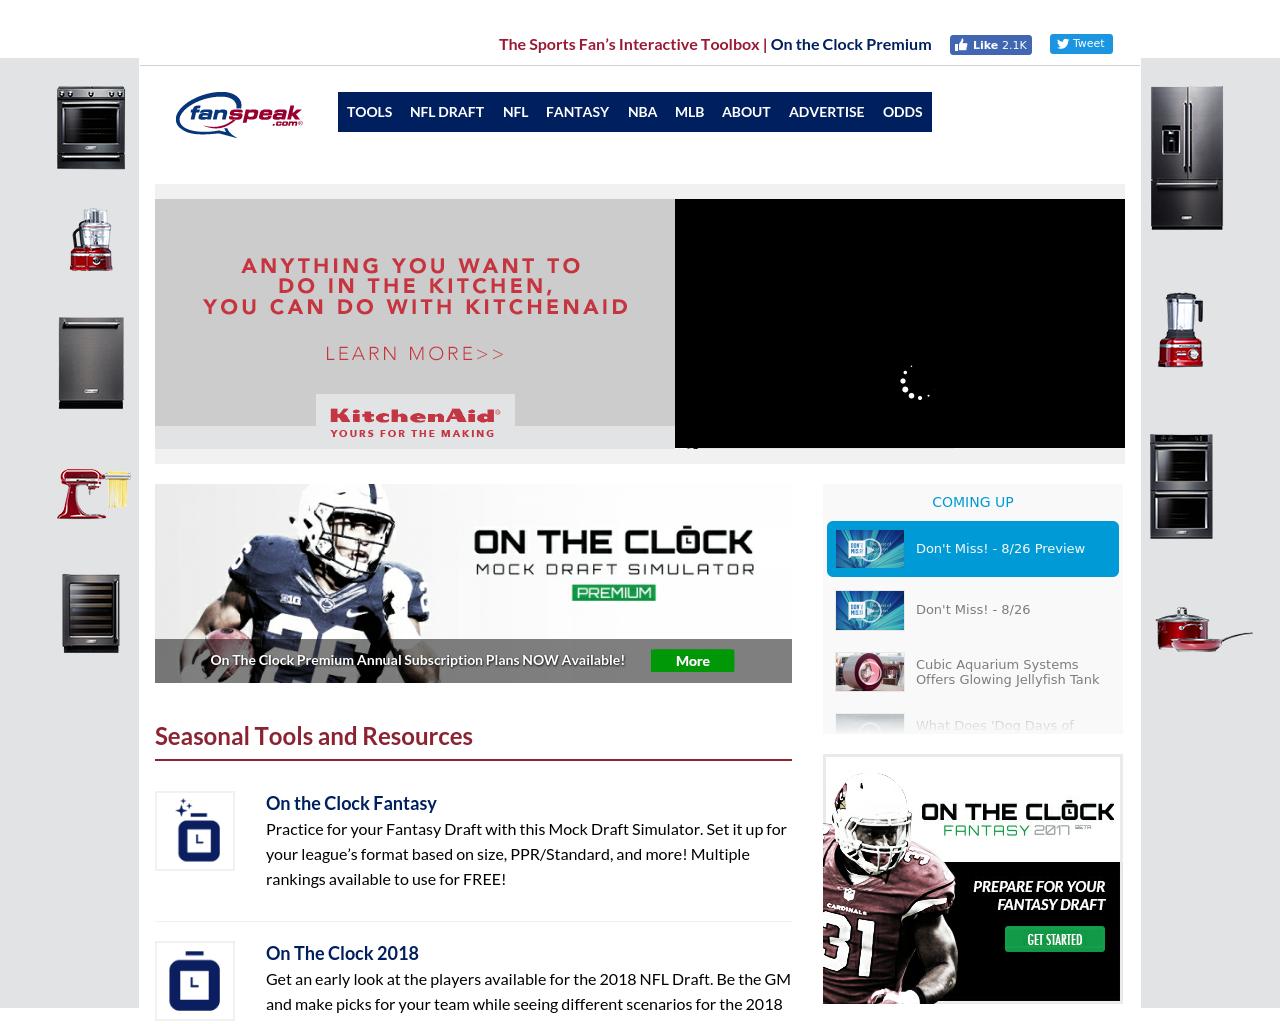 Fanspeak.com-Advertising-Reviews-Pricing